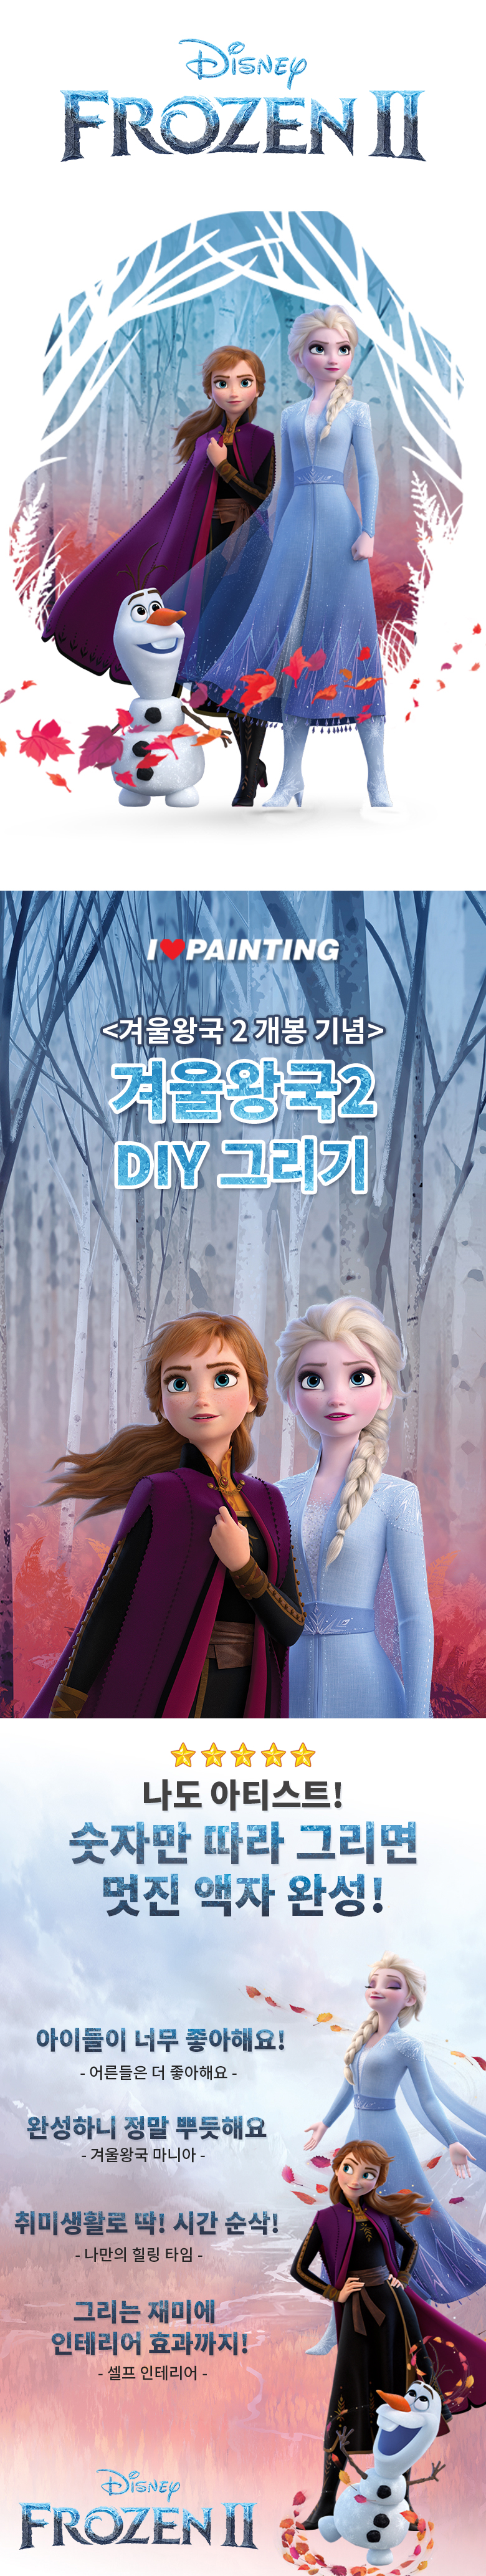 DIY 겨울왕국2 캐릭터 그리기 디즈니 아이러브페인팅 - 와이엔지글로벌, 6,900원, DIY그리기, 캐릭터 그리기